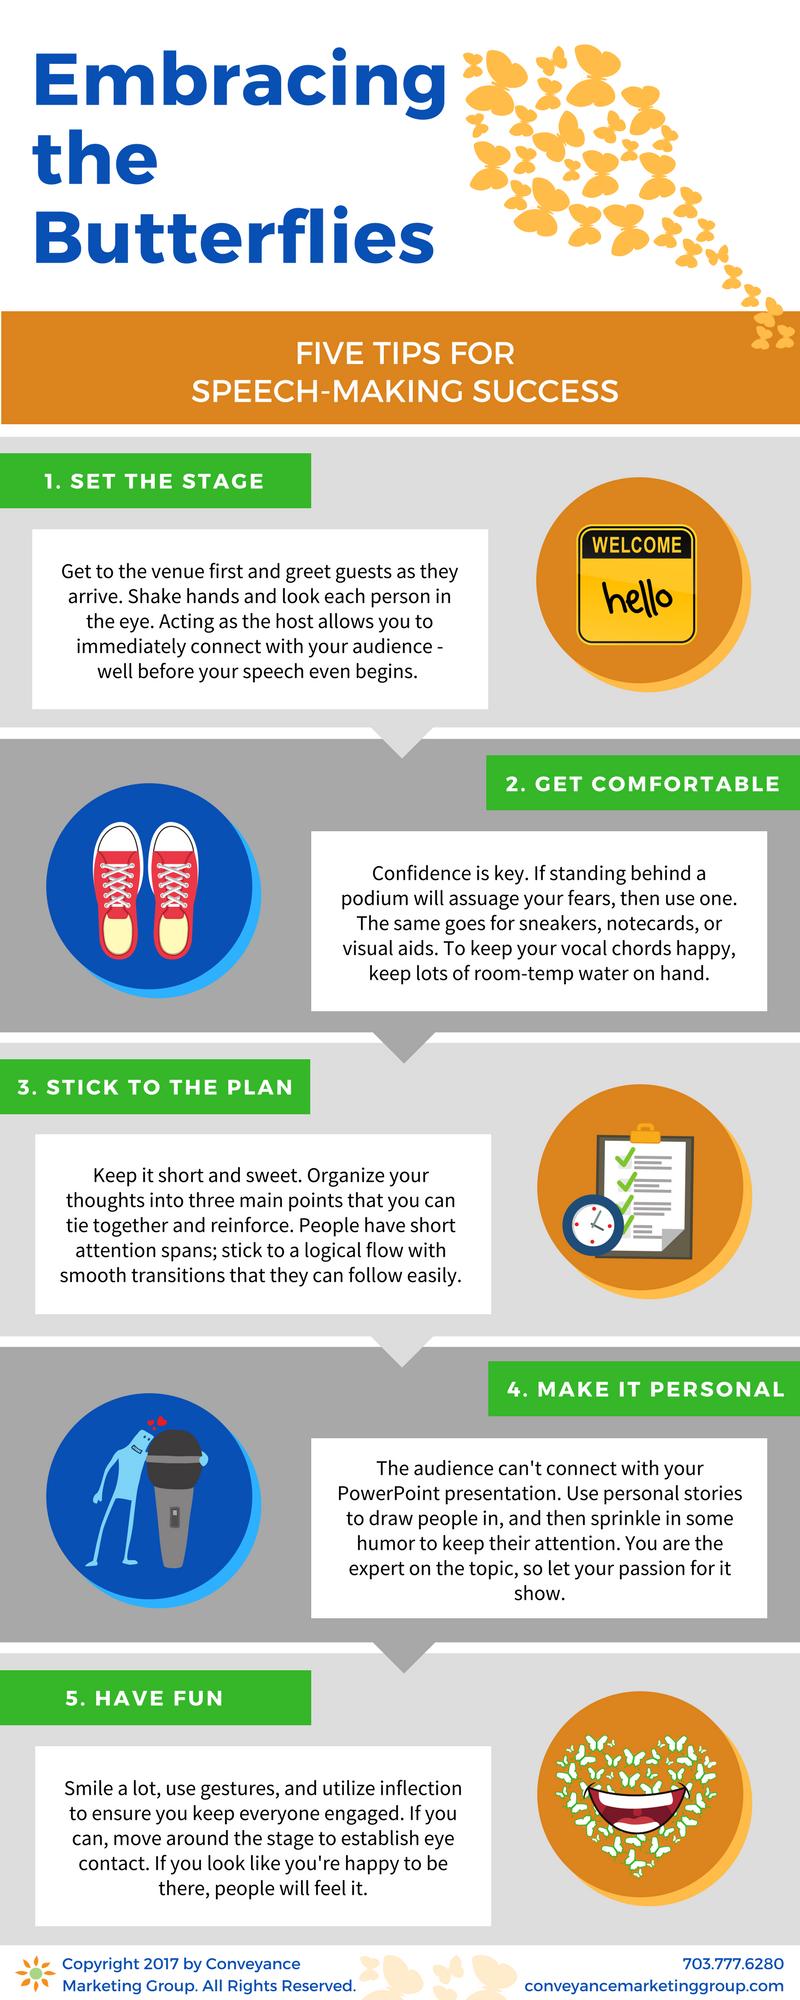 five tips for speech-making success